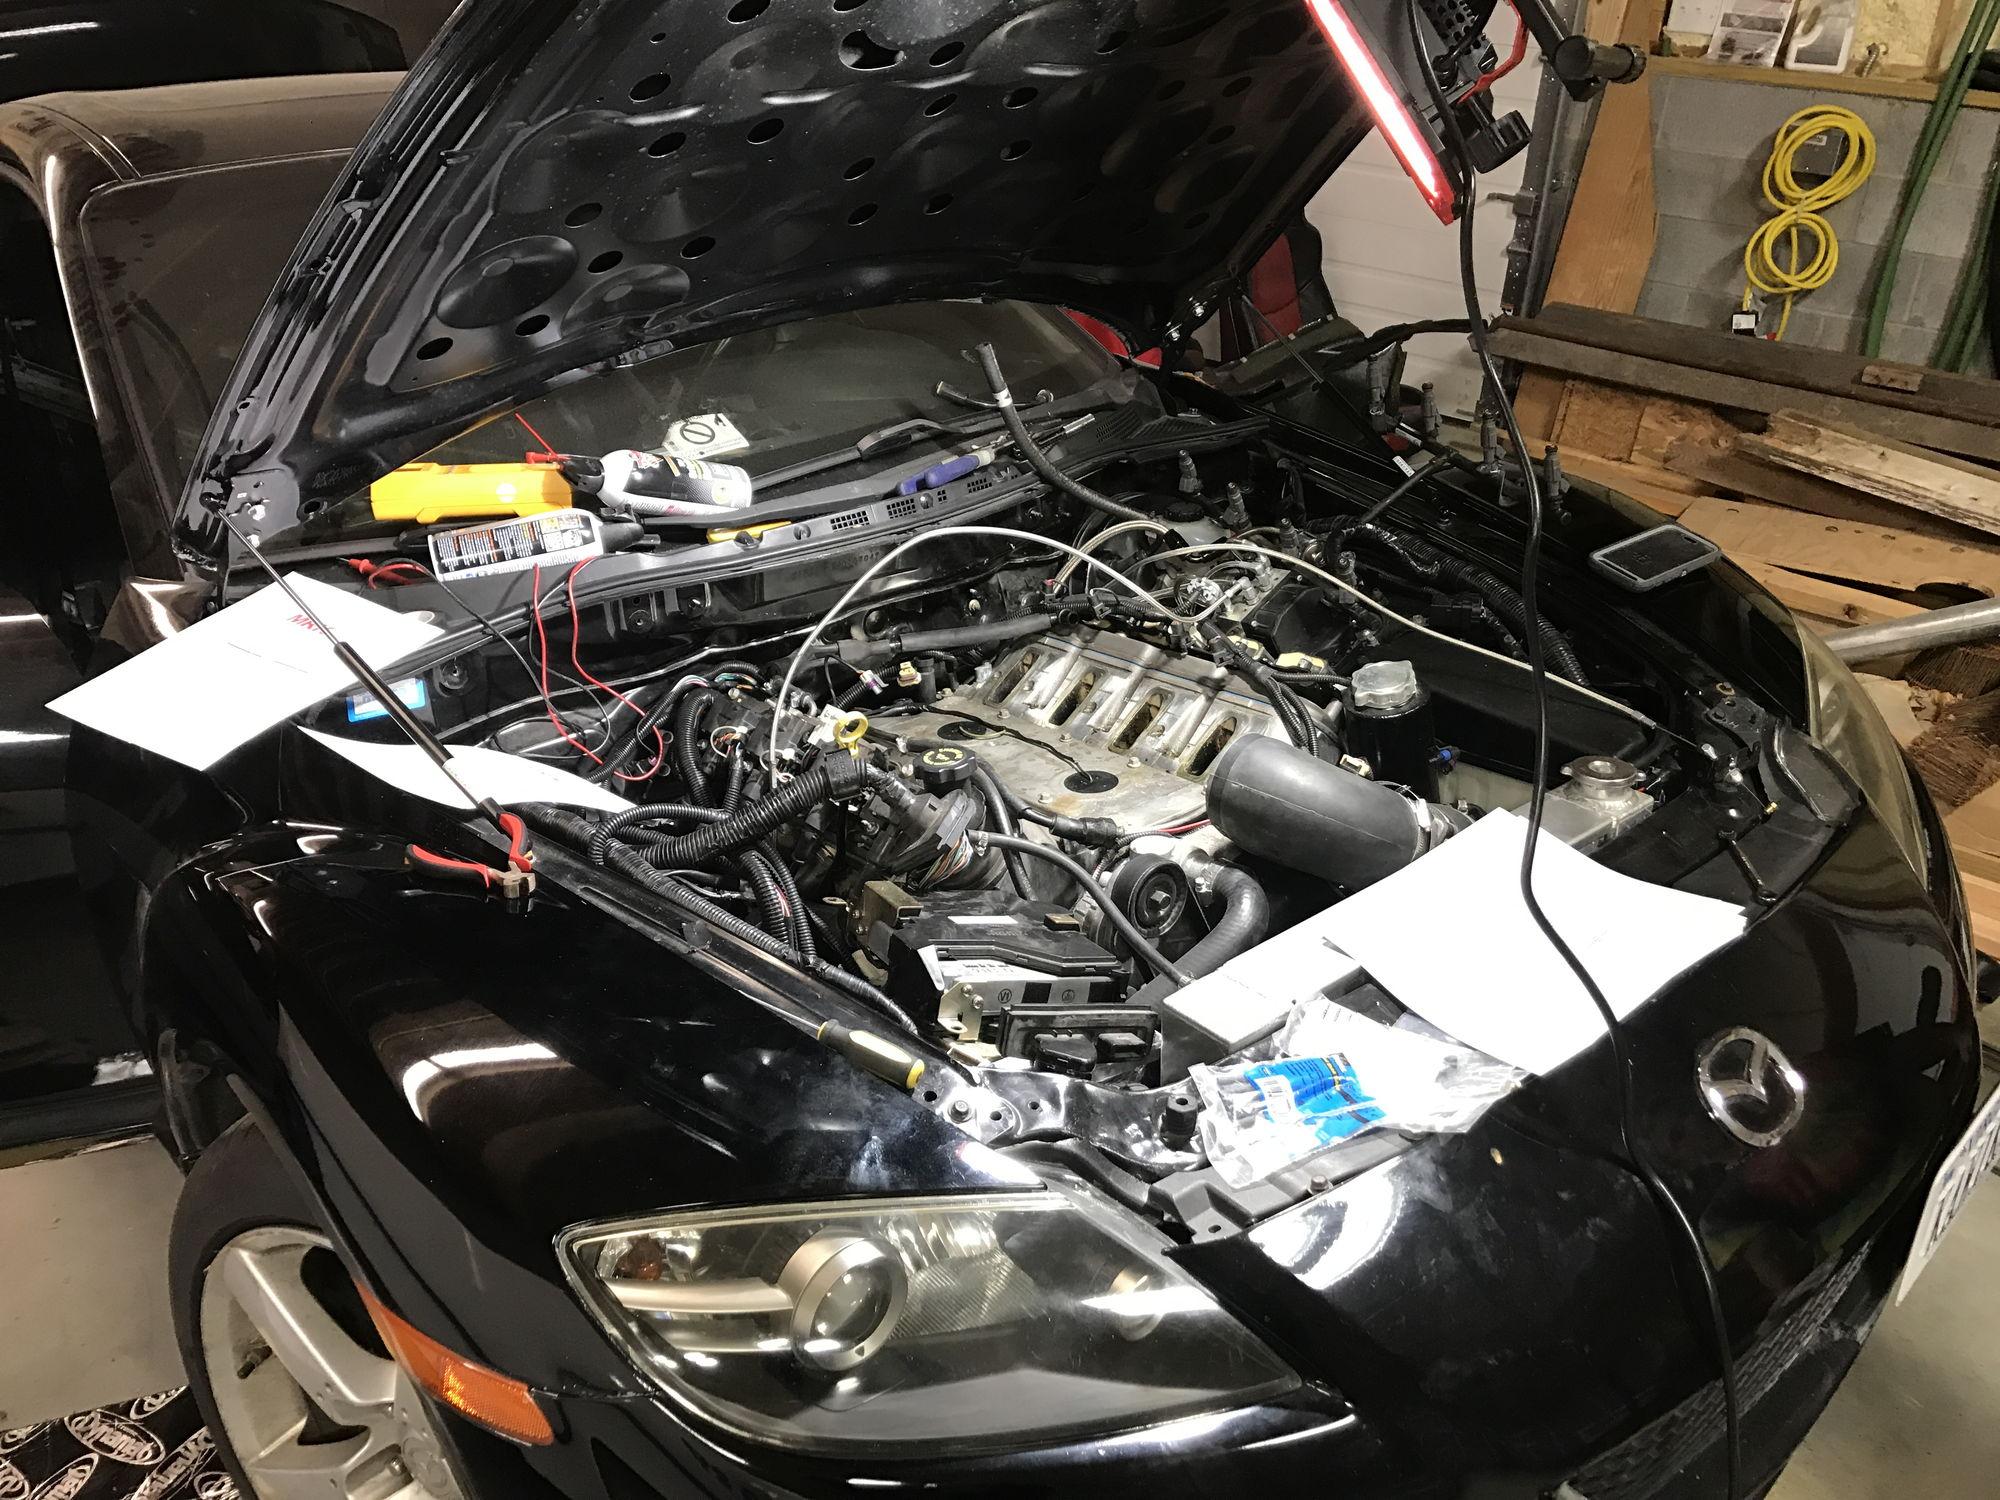 Mazda Rx8 Engine Conversion Kits | CINEMAS 93